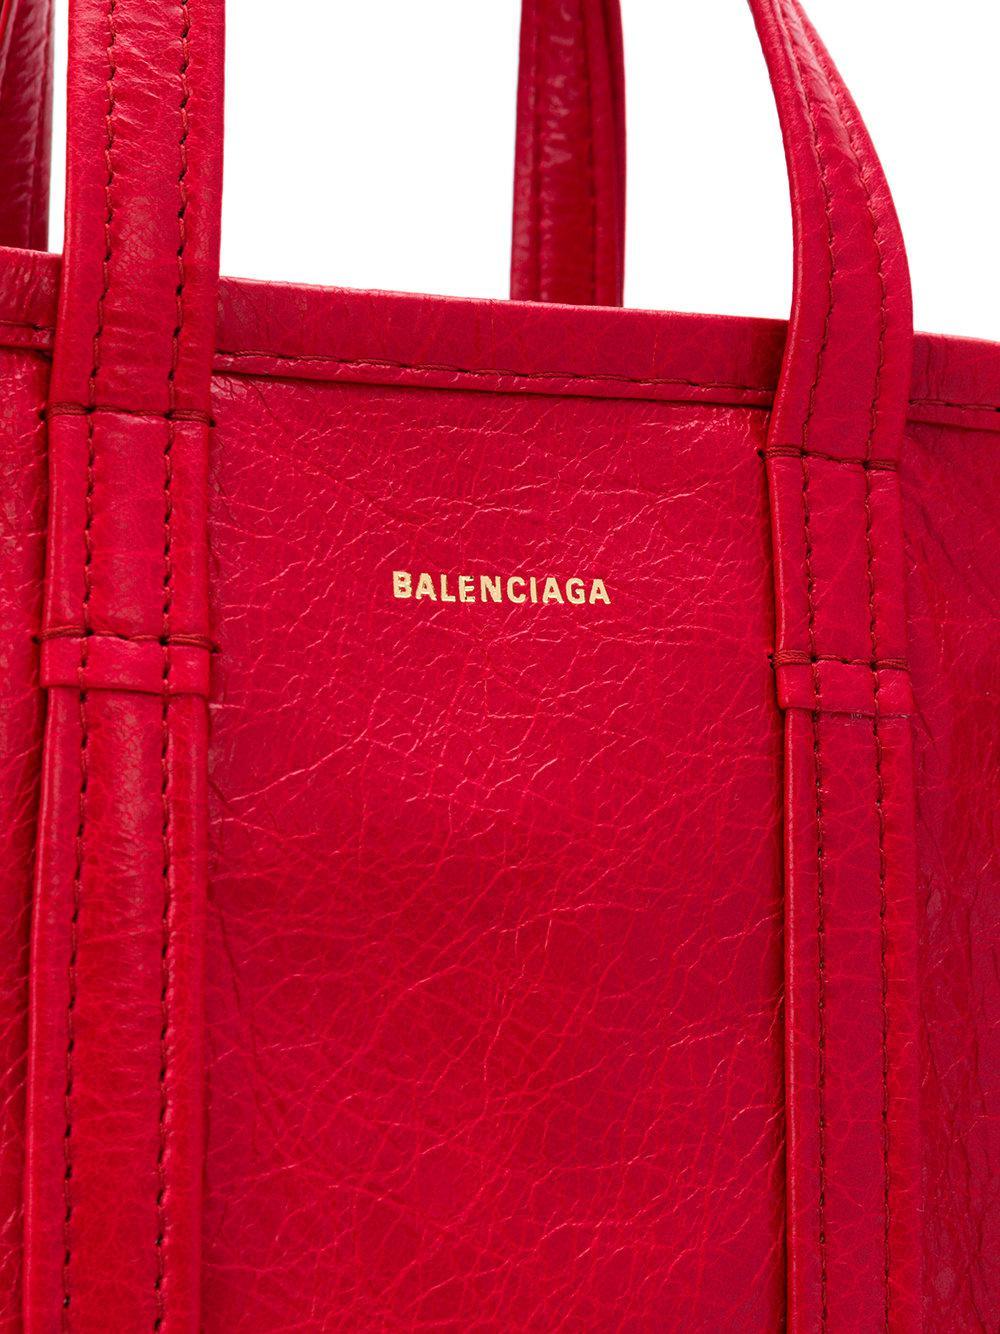 Coloris Main Rouge En Bazar À Xxs Shopper Balenciaga Lyst Sac VMpSUz